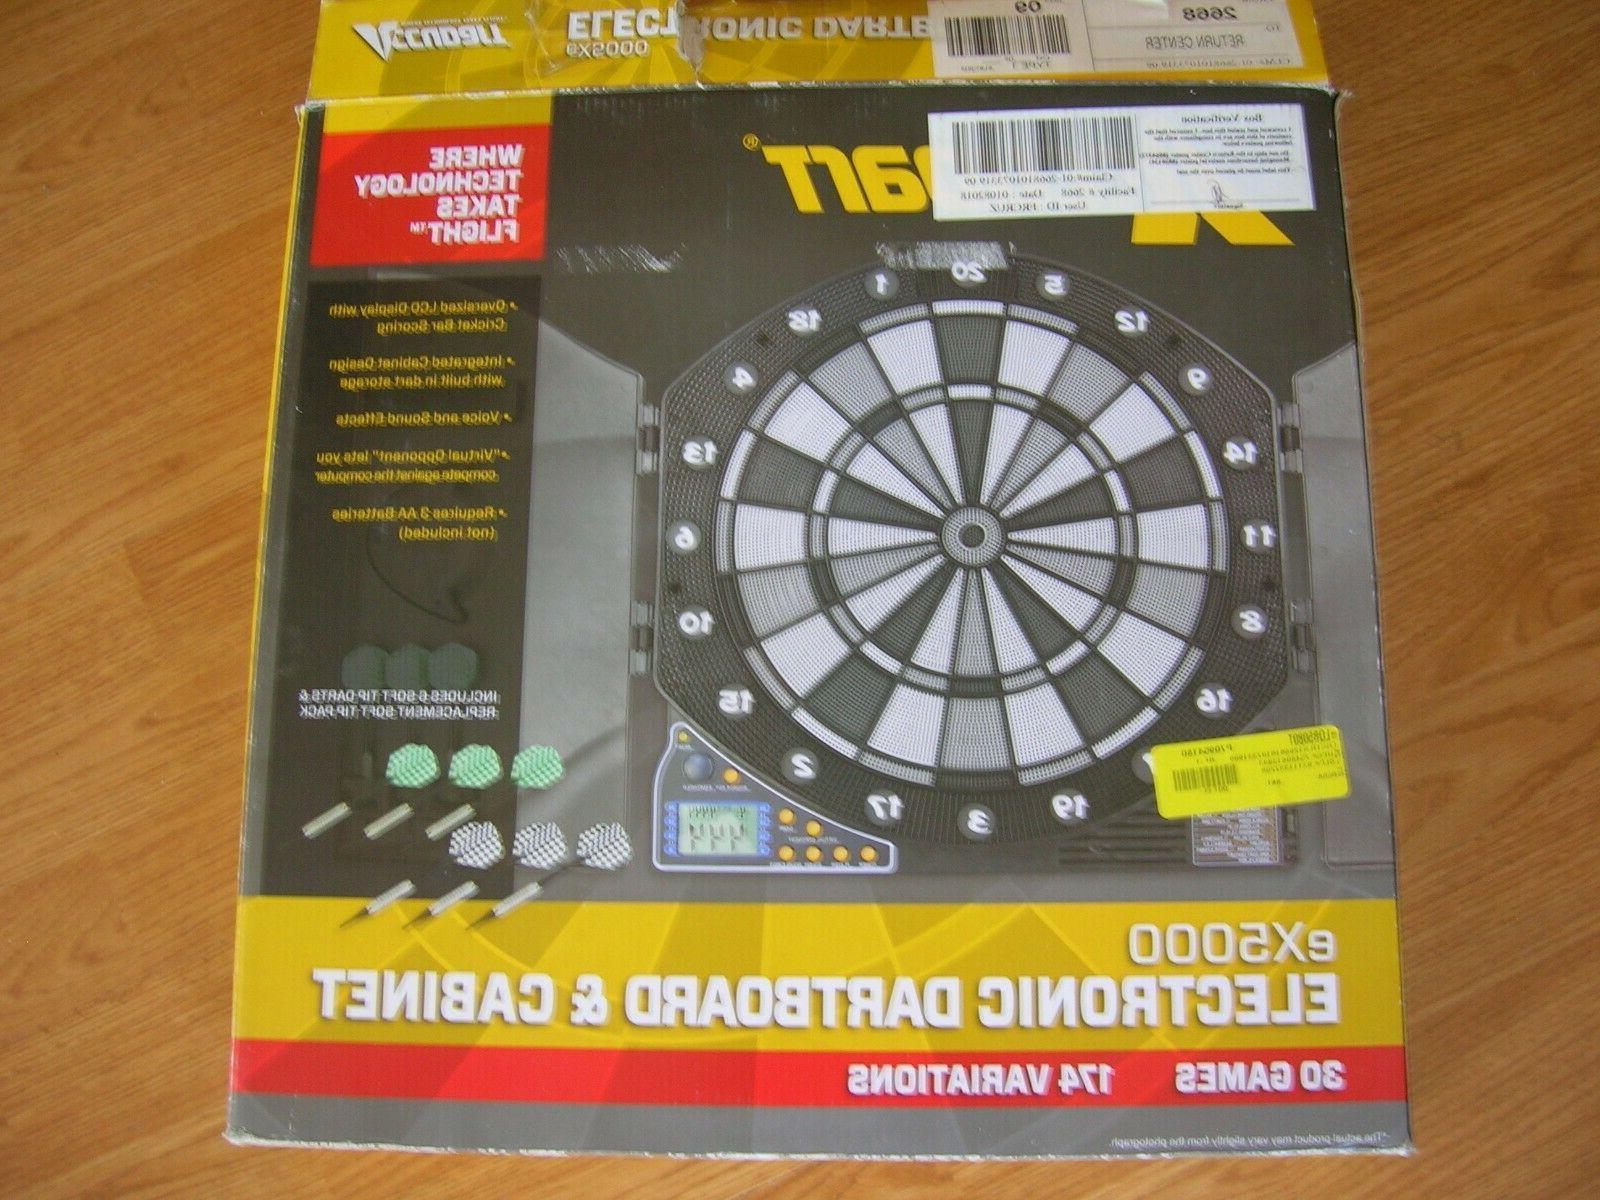 Accudart EX5000 & Cabinet Games 174 Variations Darts